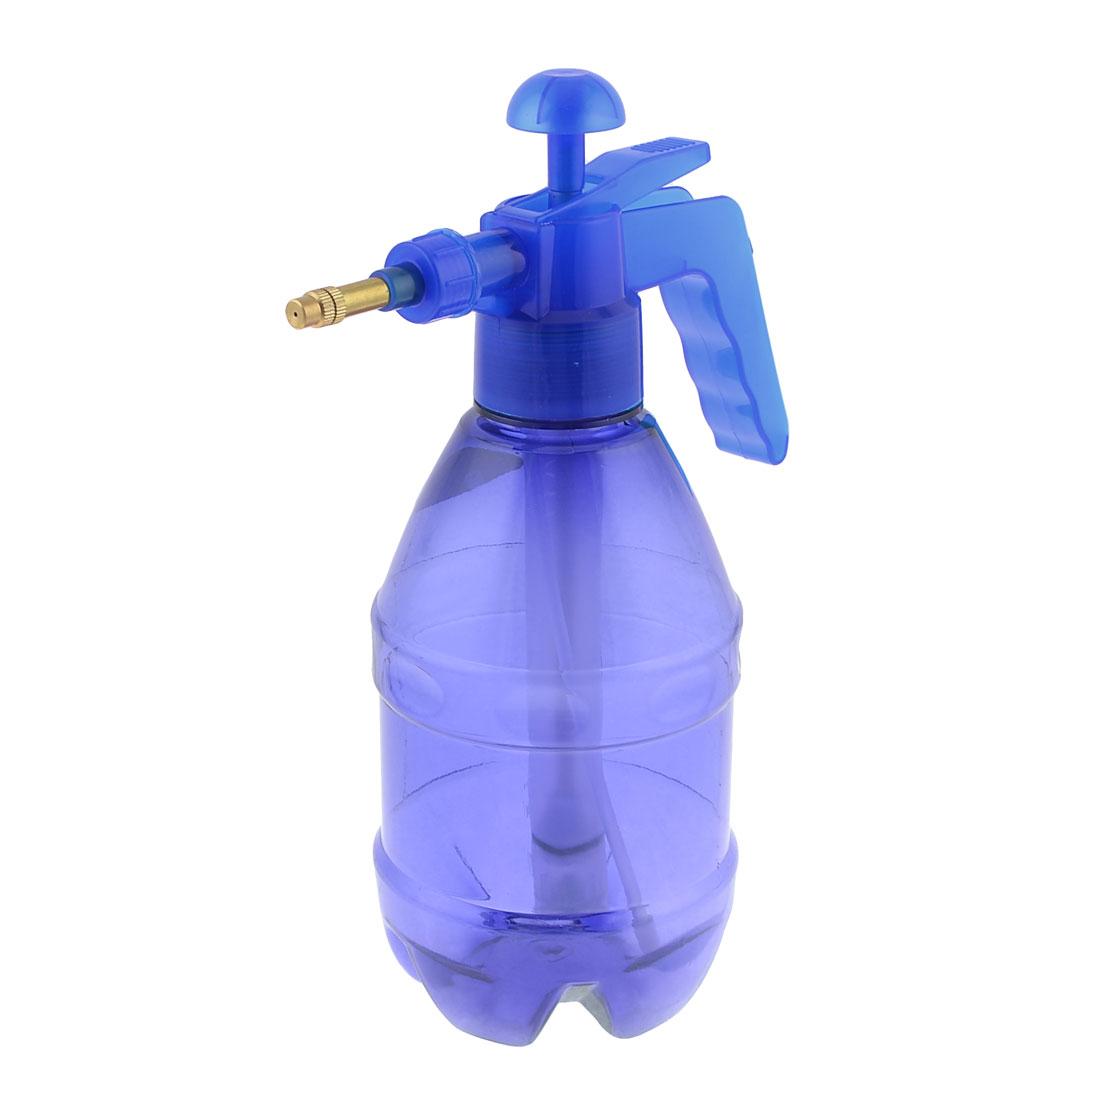 Transparent Plastic Flower Plant Sprayer Blue 1.5L Bottle